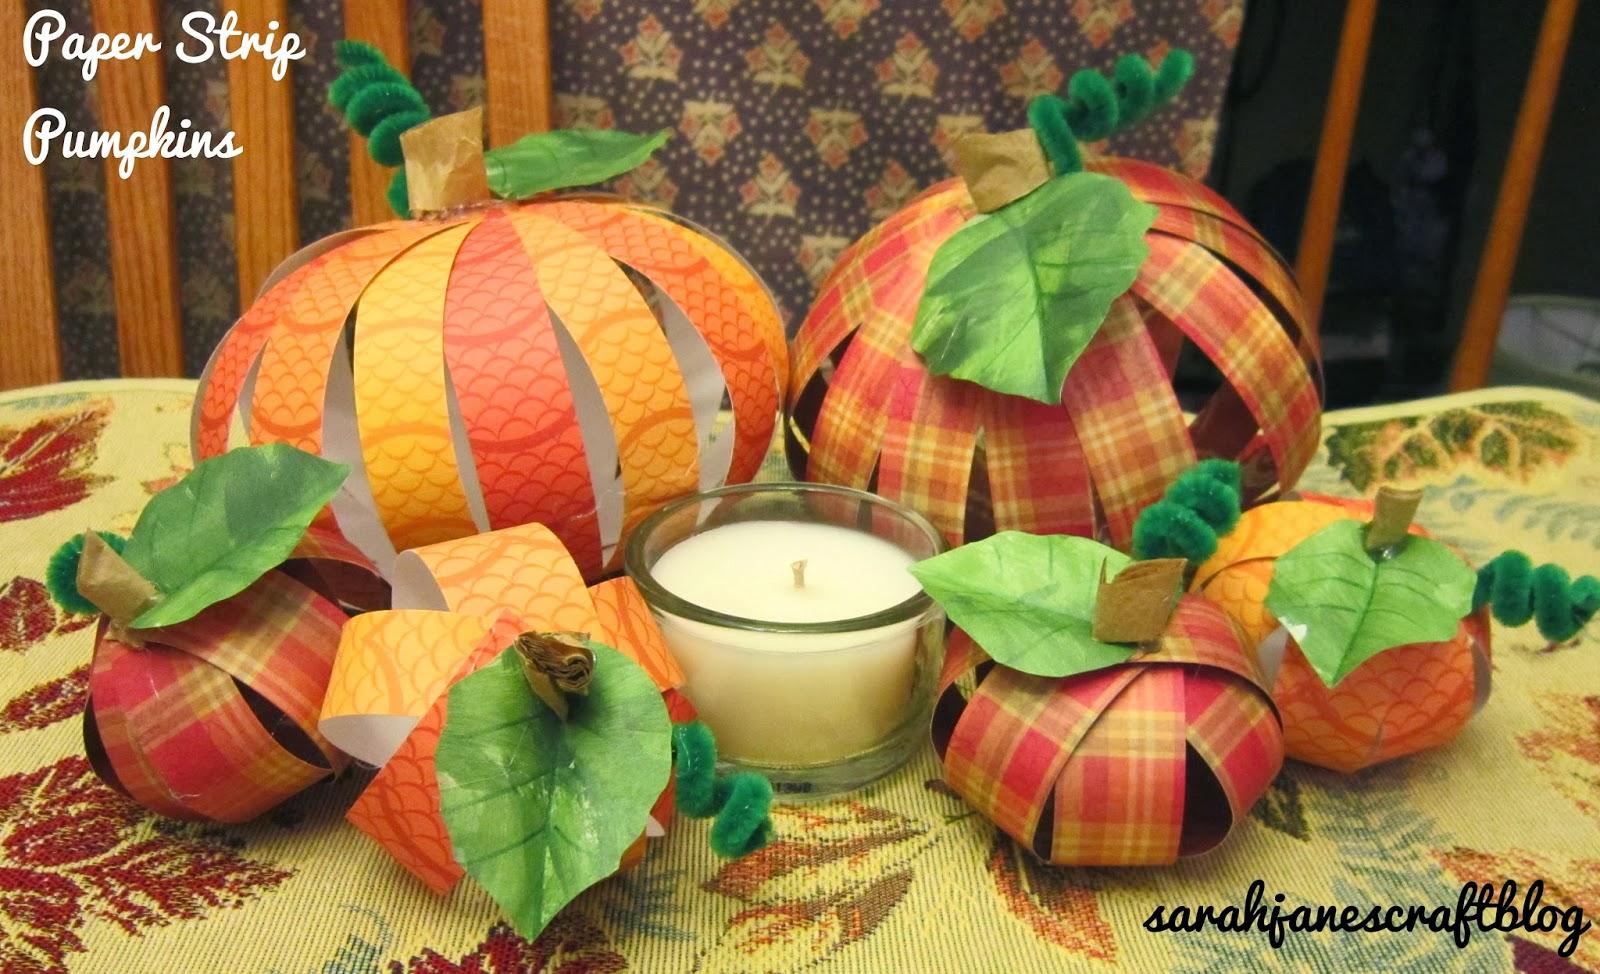 Sarah Jane S Craft Blog Paper Strip Pumpkins